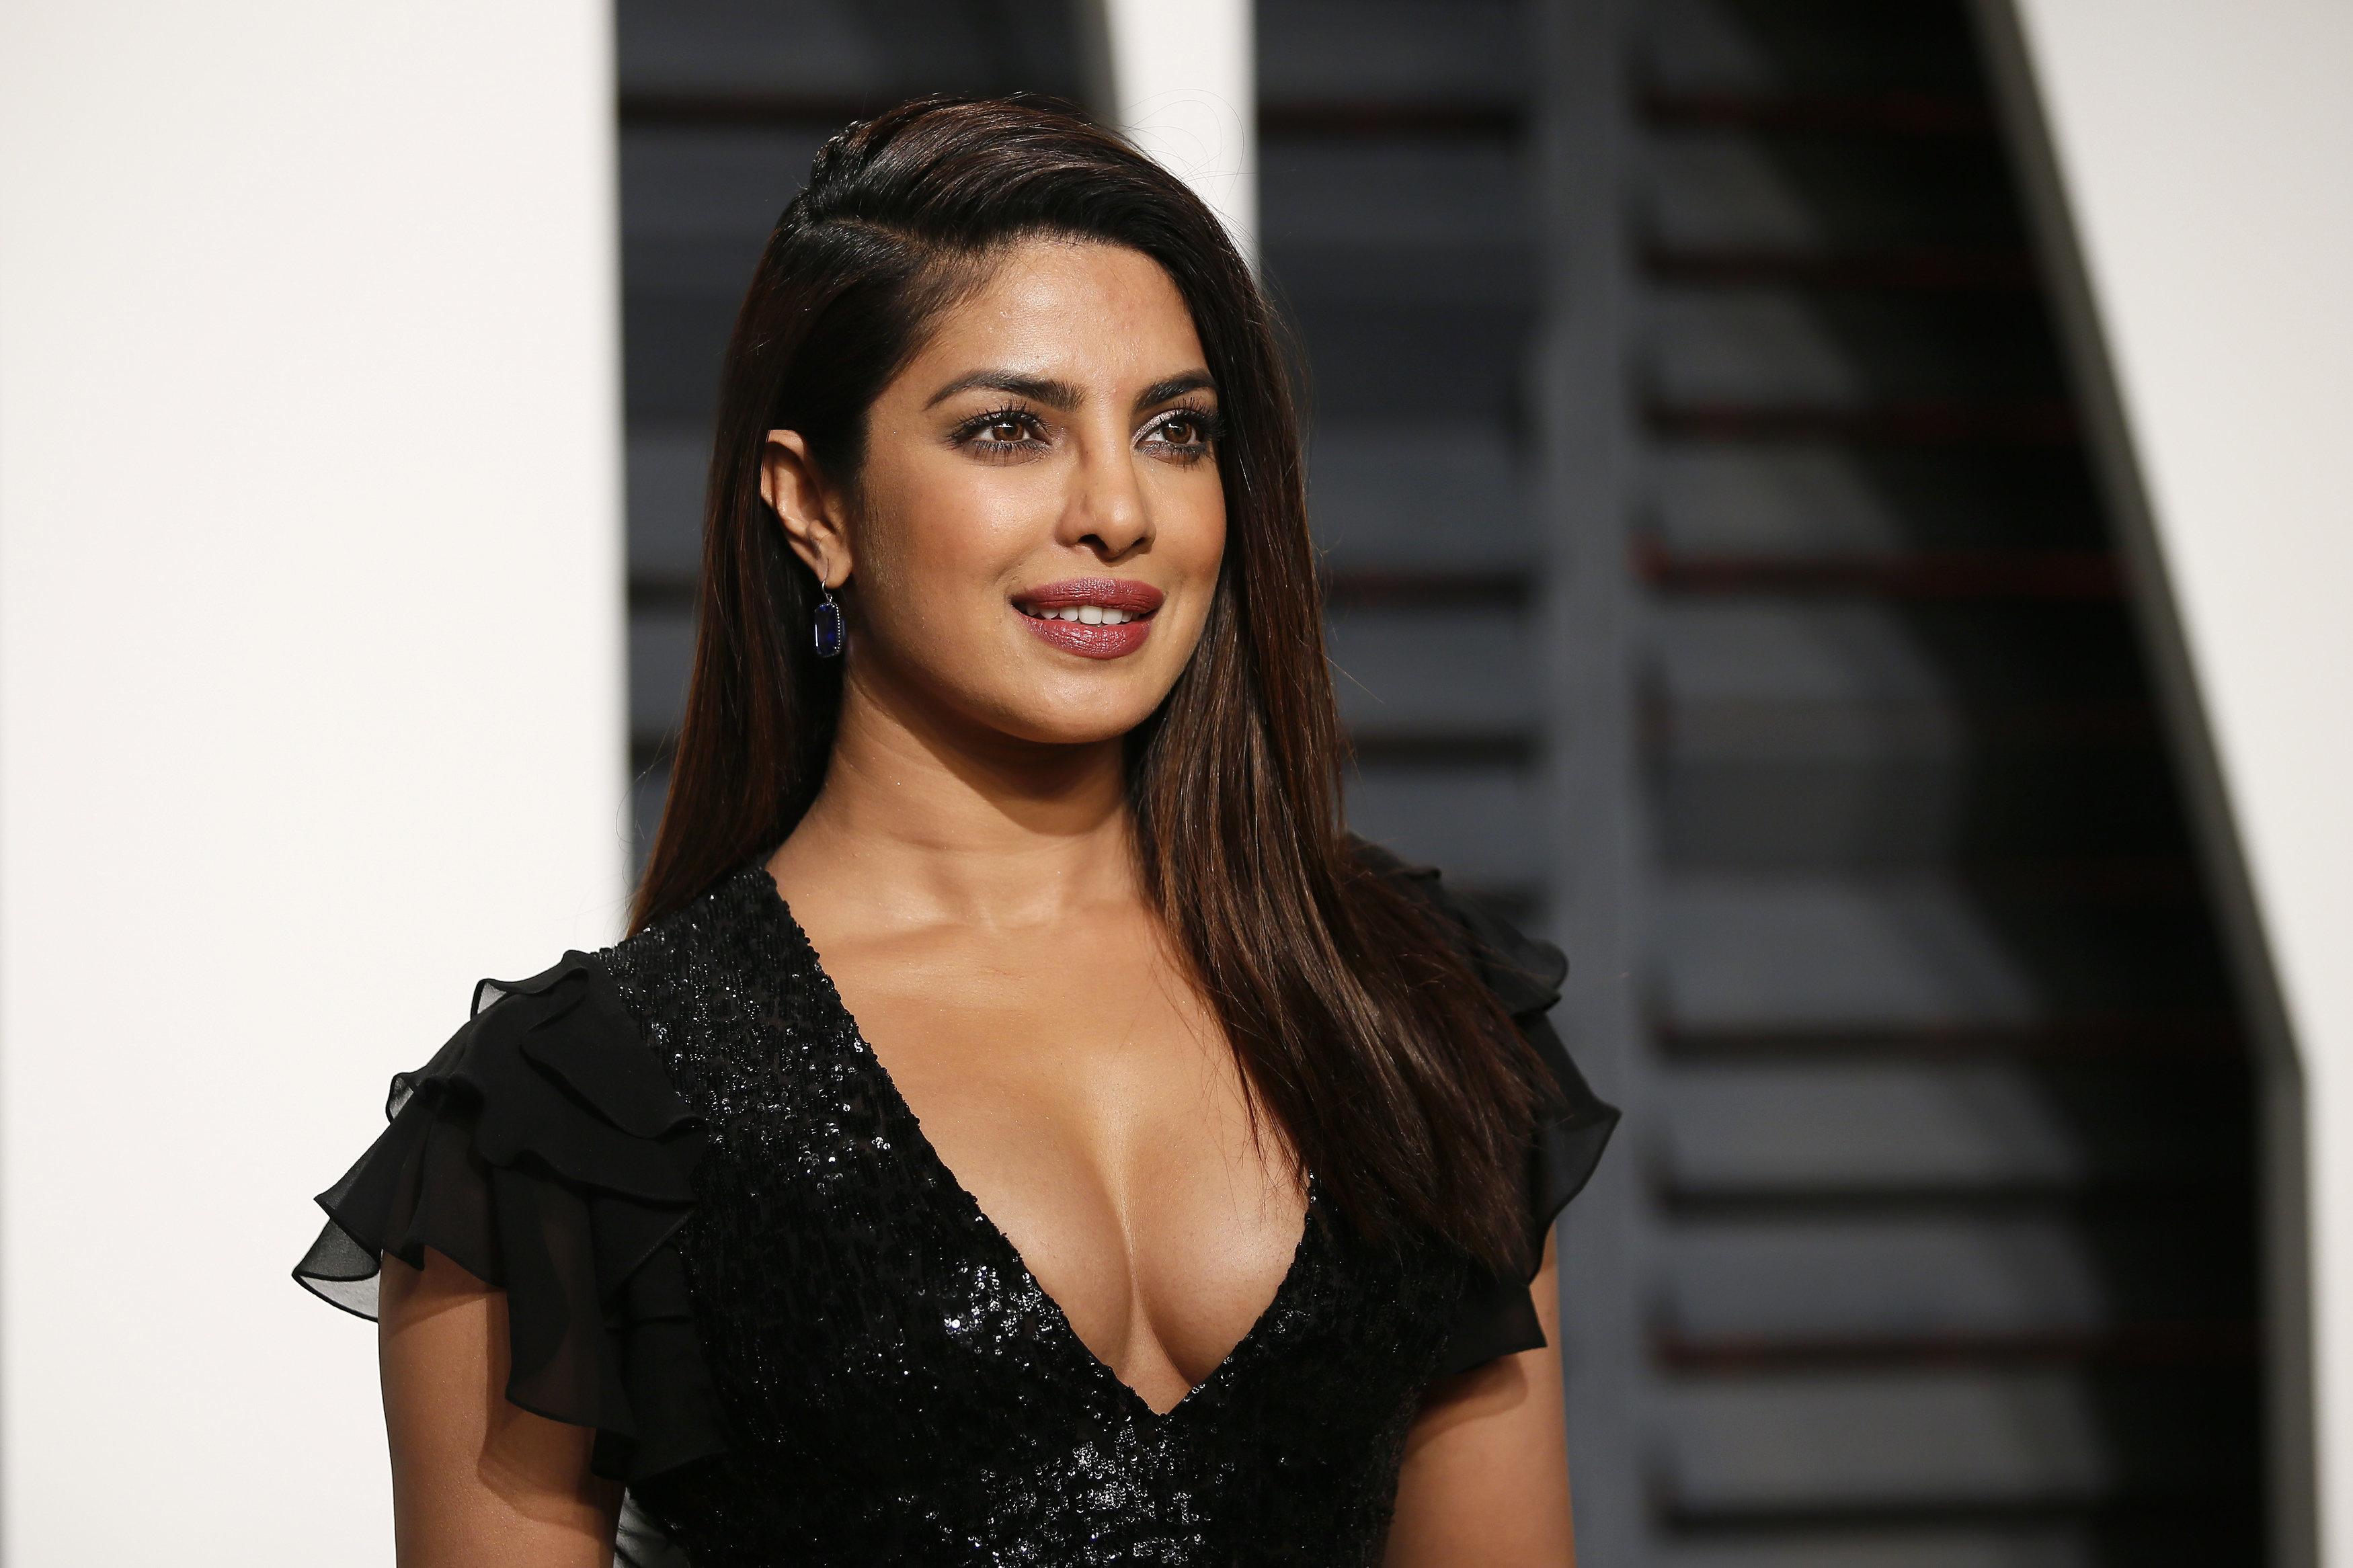 Priyanka Chopra at the 2017 Oscars Vanity Fair Party.